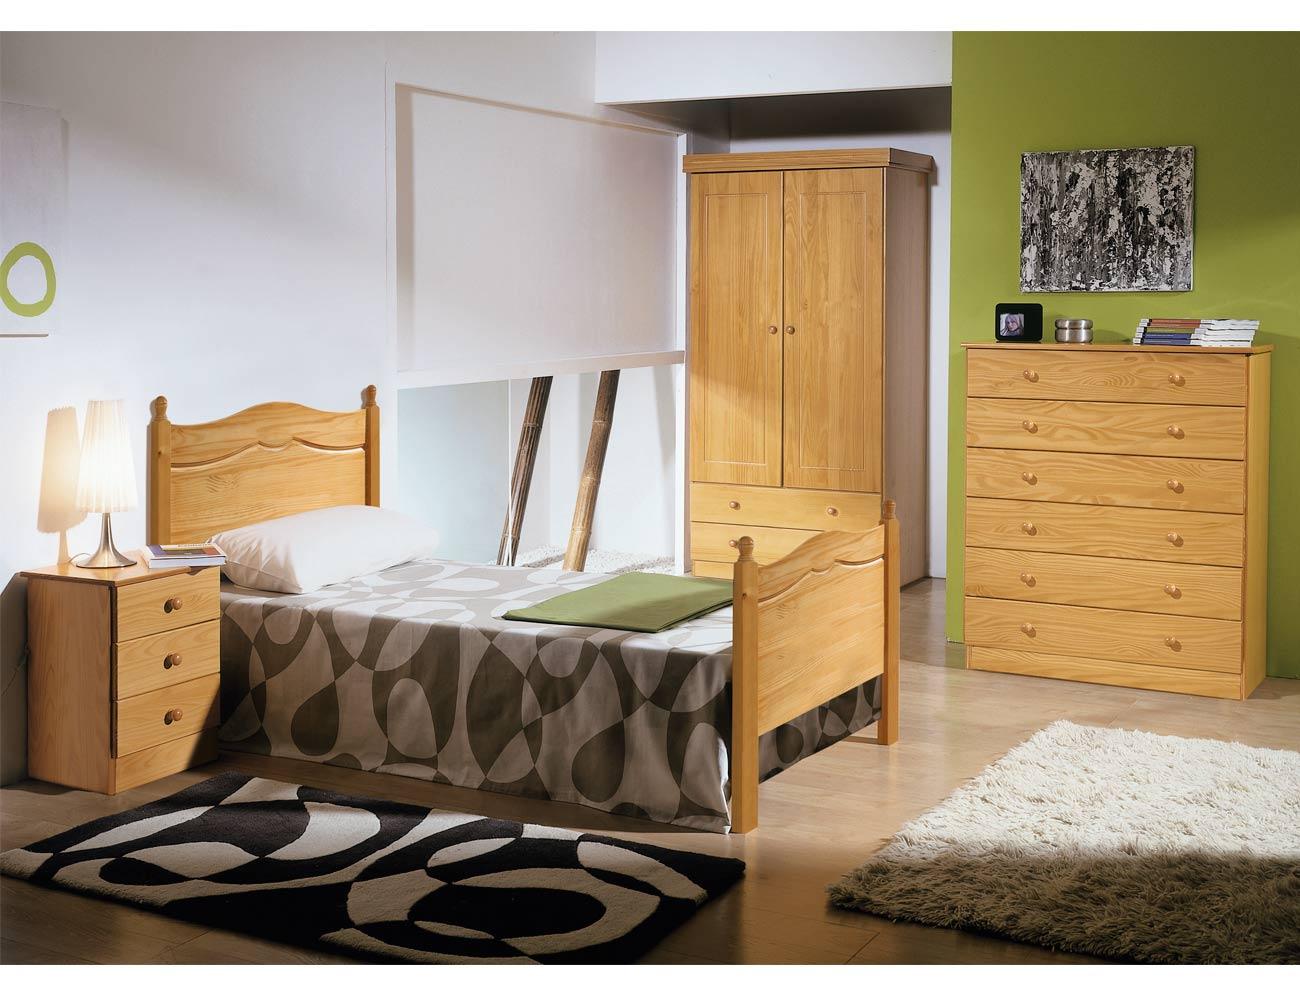 Dormitorio juvenil malaga madera pino provenzal1